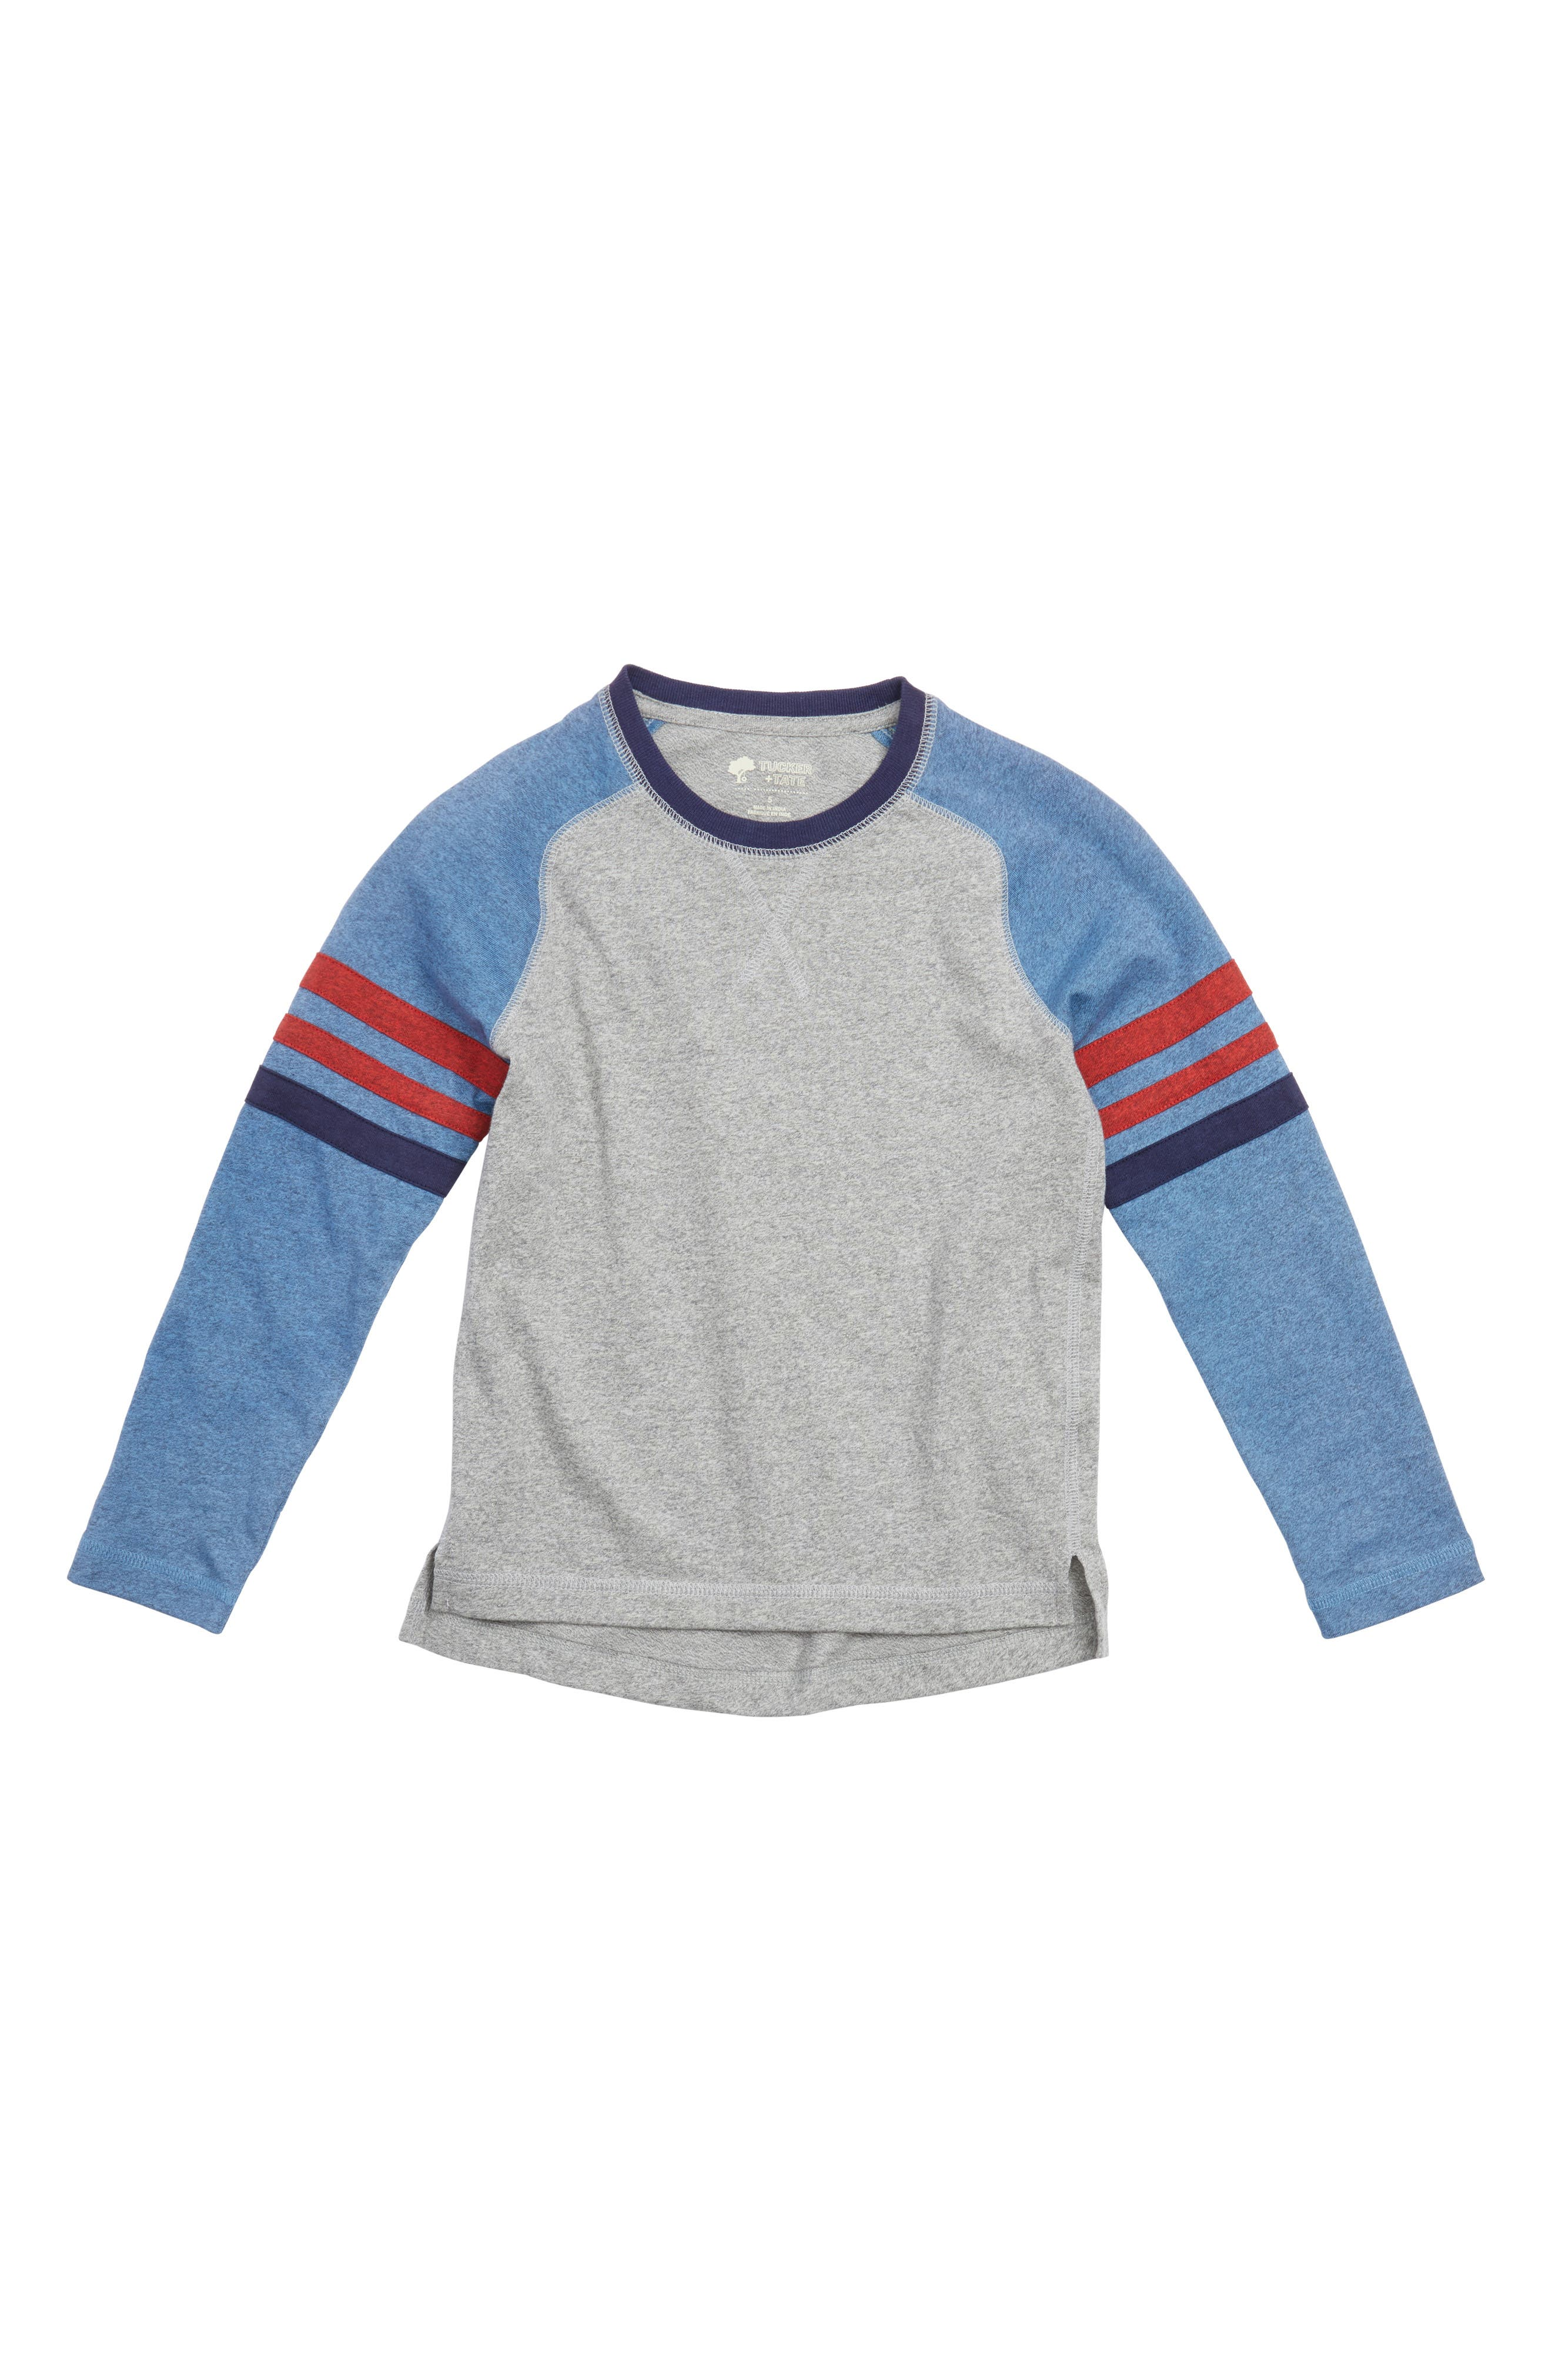 Tucker + Tate Varsity Raglan T-Shirt (Toddler Boys & Little Boys)